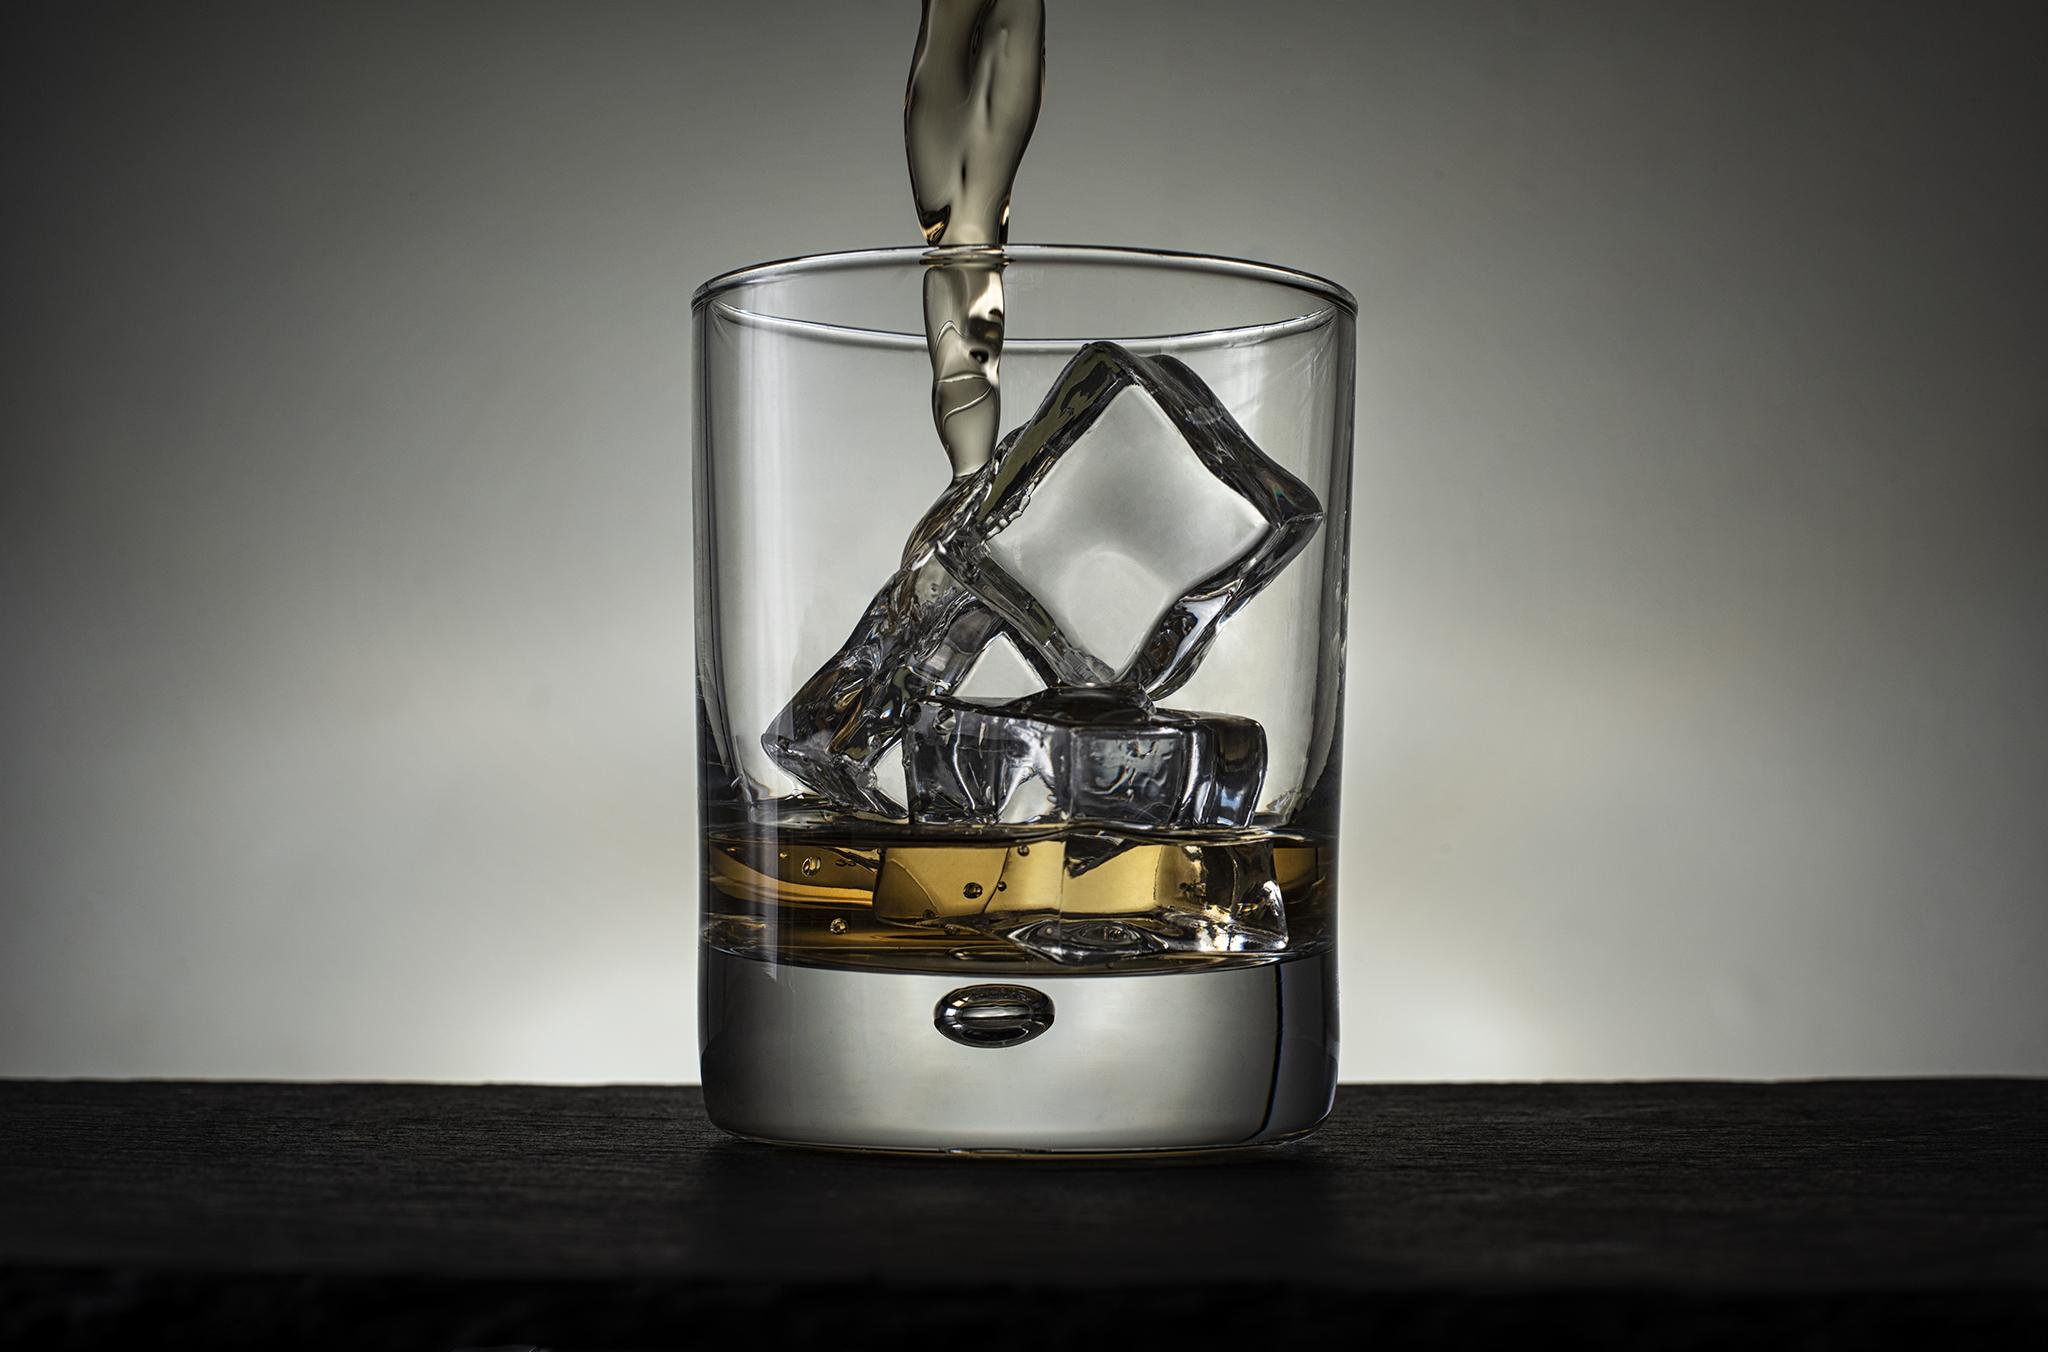 Creative Photography - Whisky